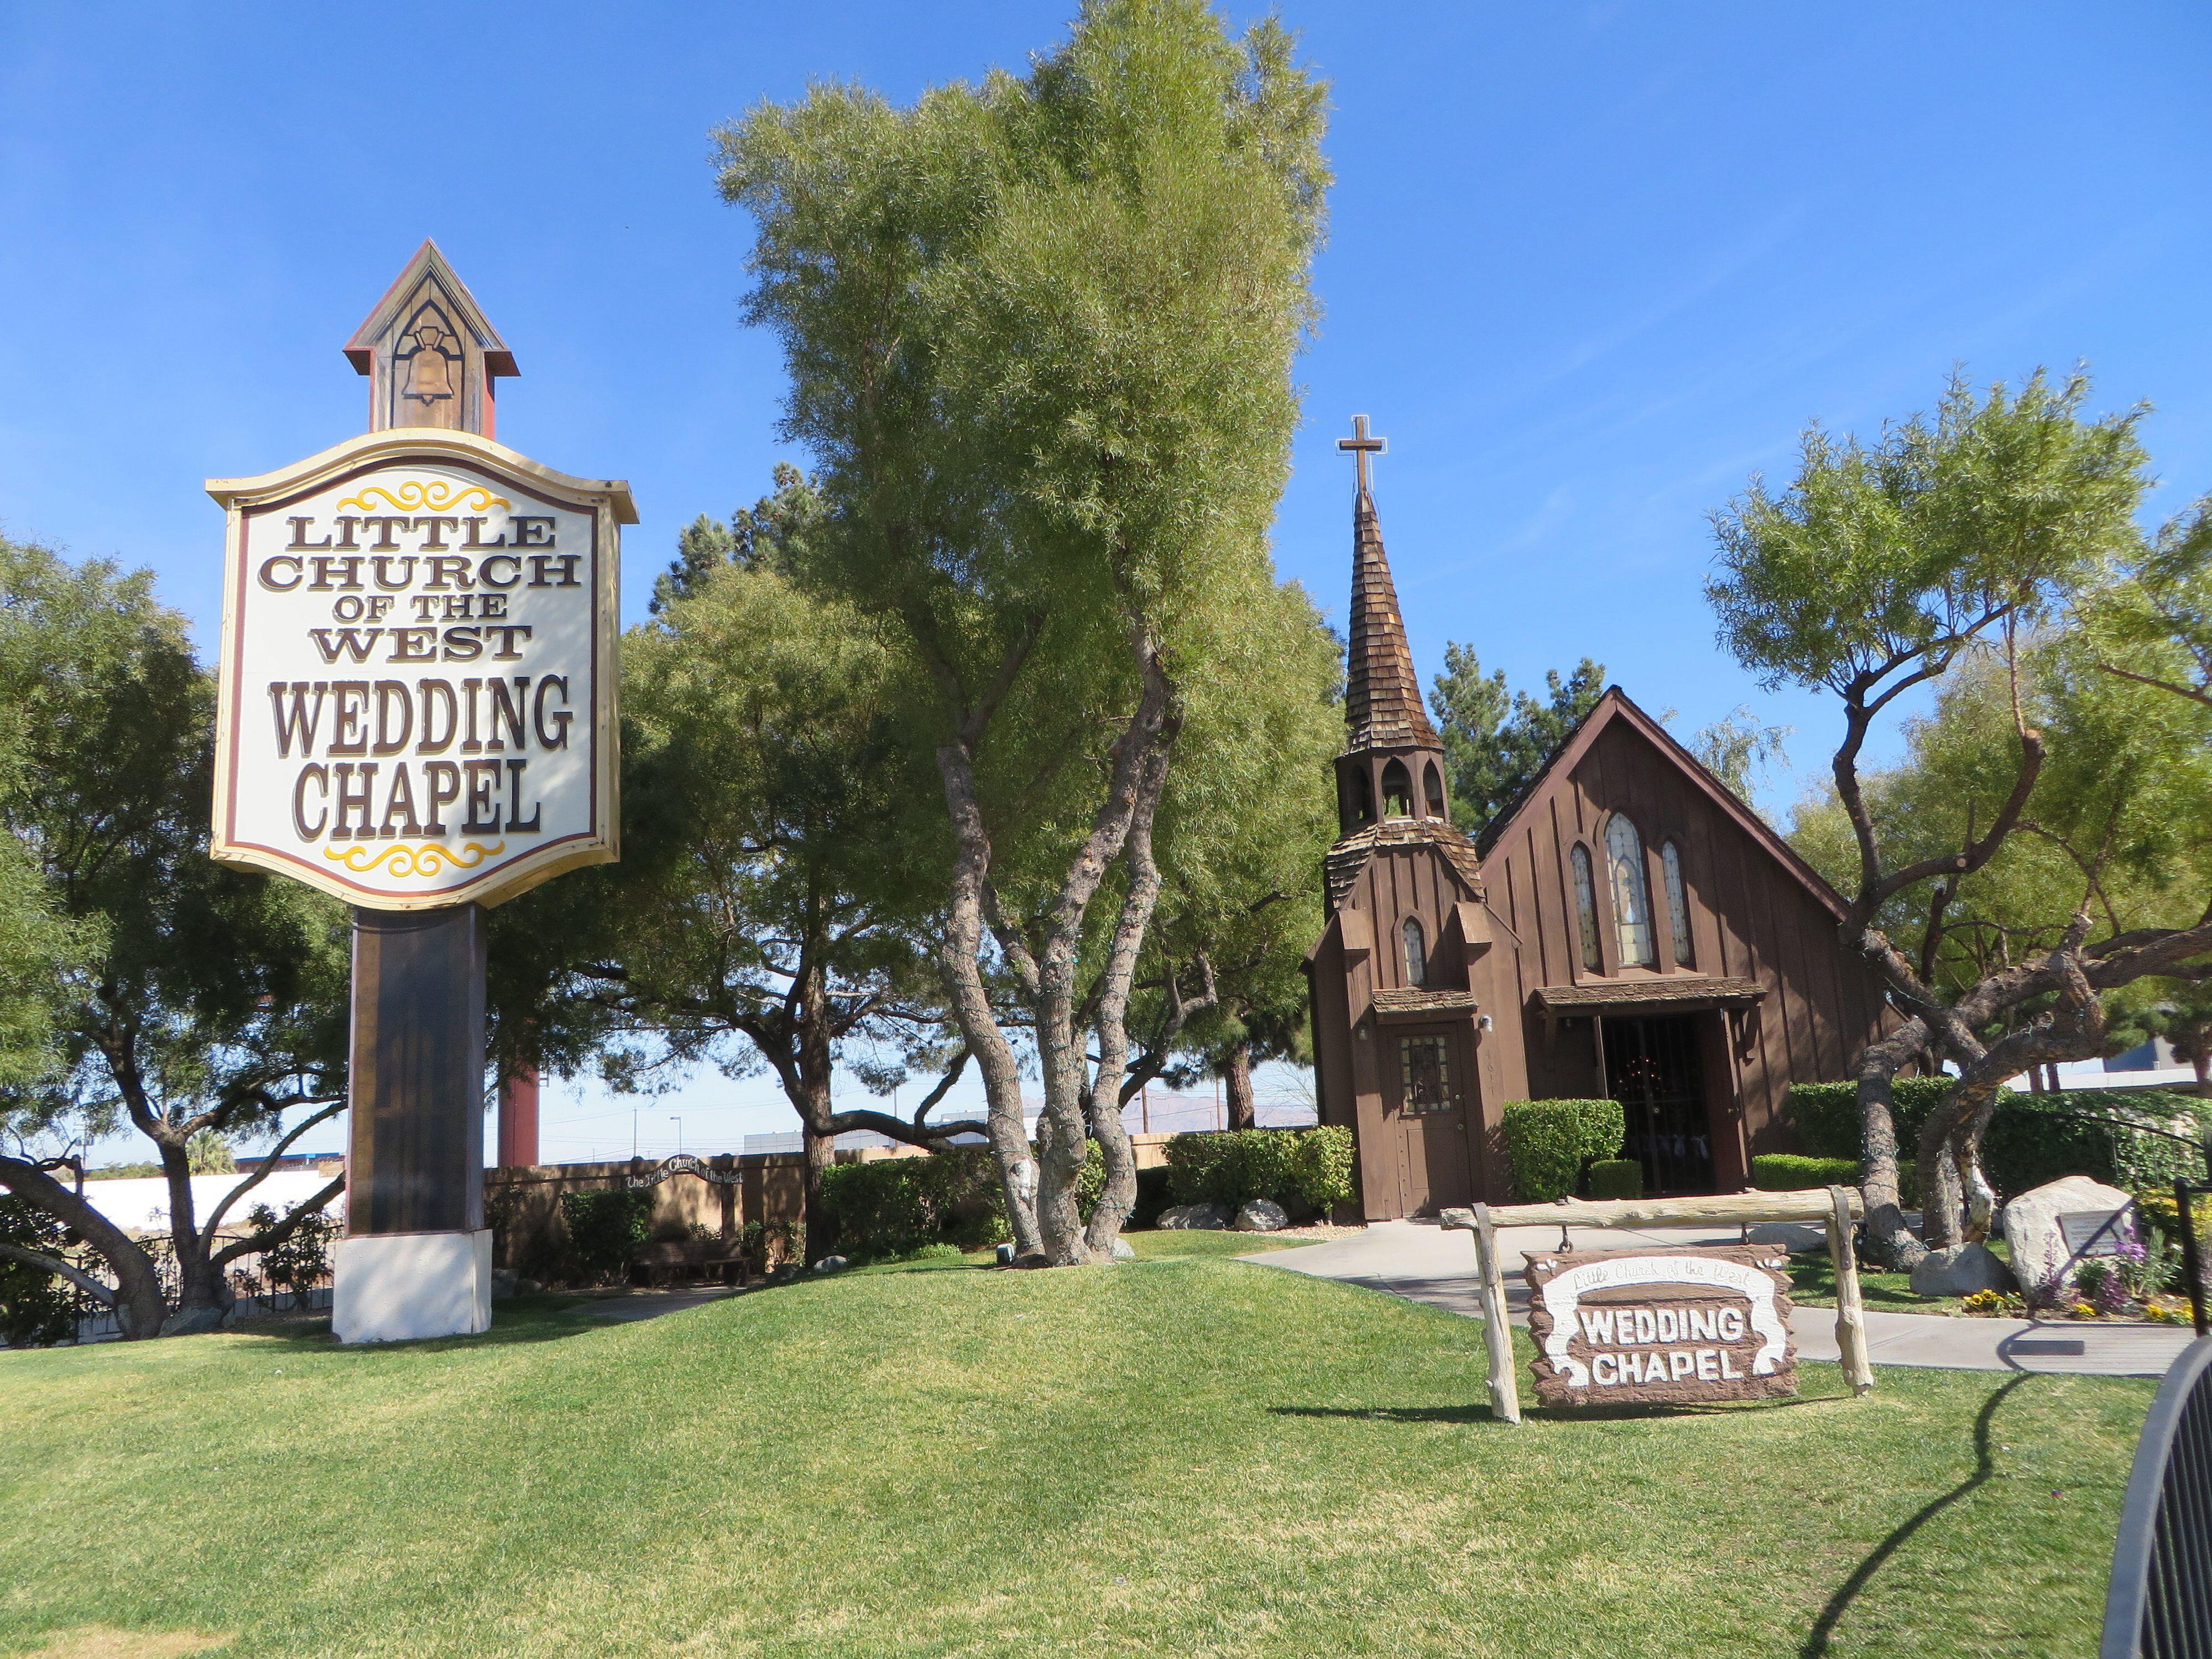 Little Church of the West Wedding Chapel, Las Vegas